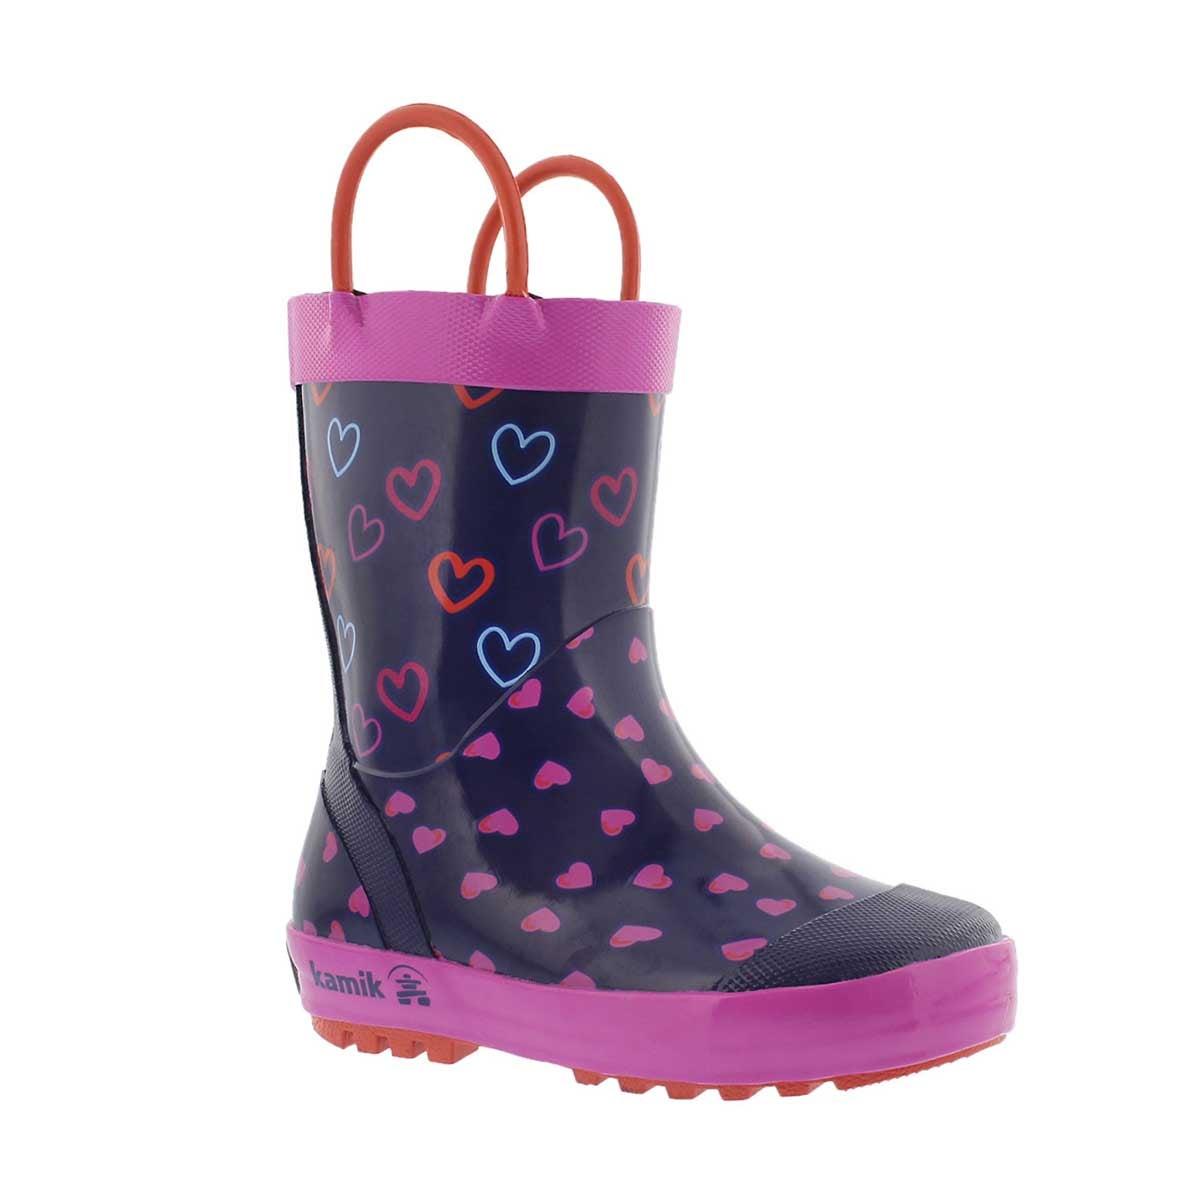 Grls Cherish purple rain boot